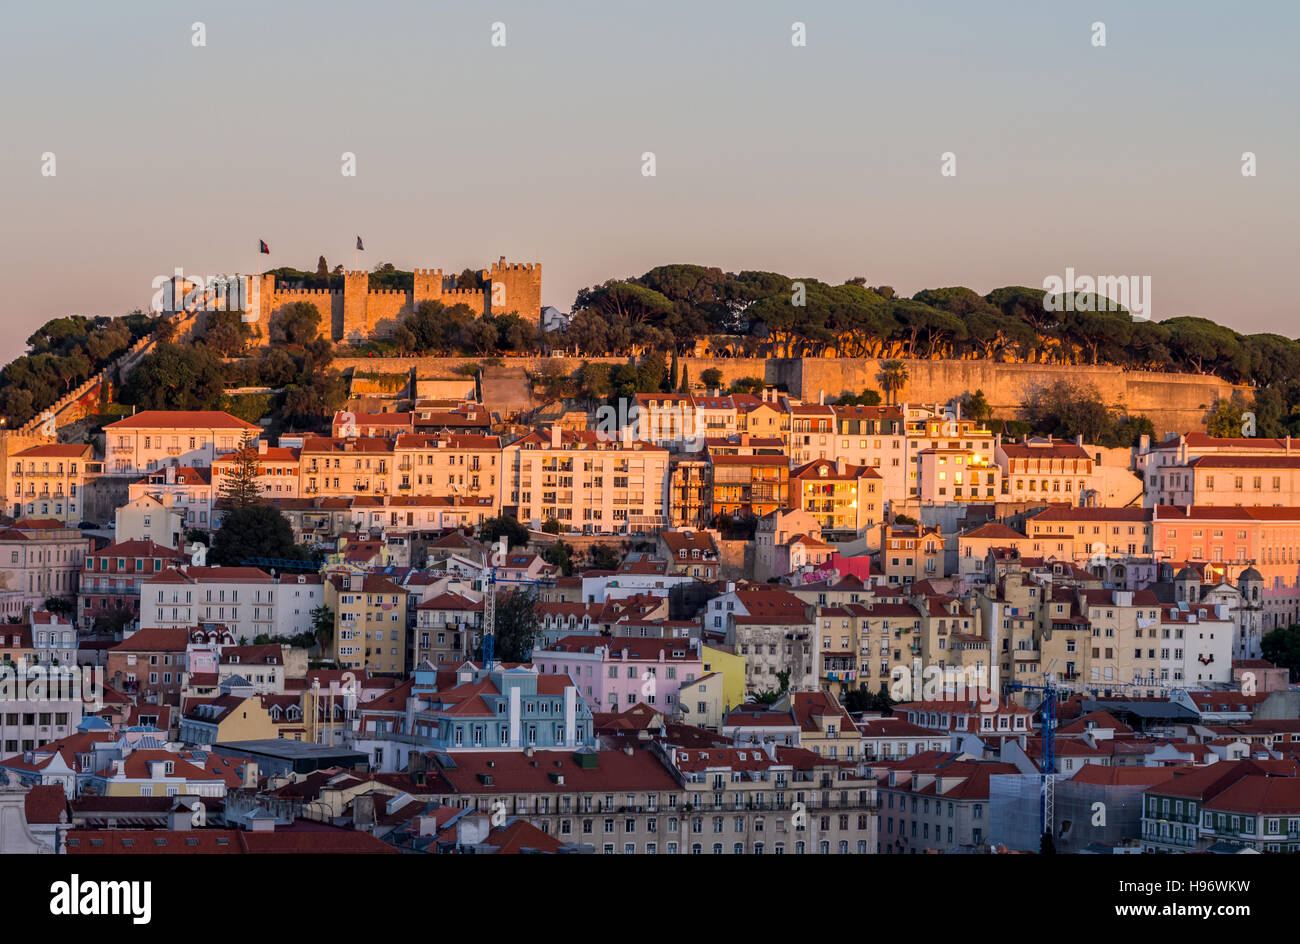 Rues de la région de Lisbonne, Portugal, avec le Château Sao Jorge Miradouro de Sao Pedro de Alcantara Photo Stock